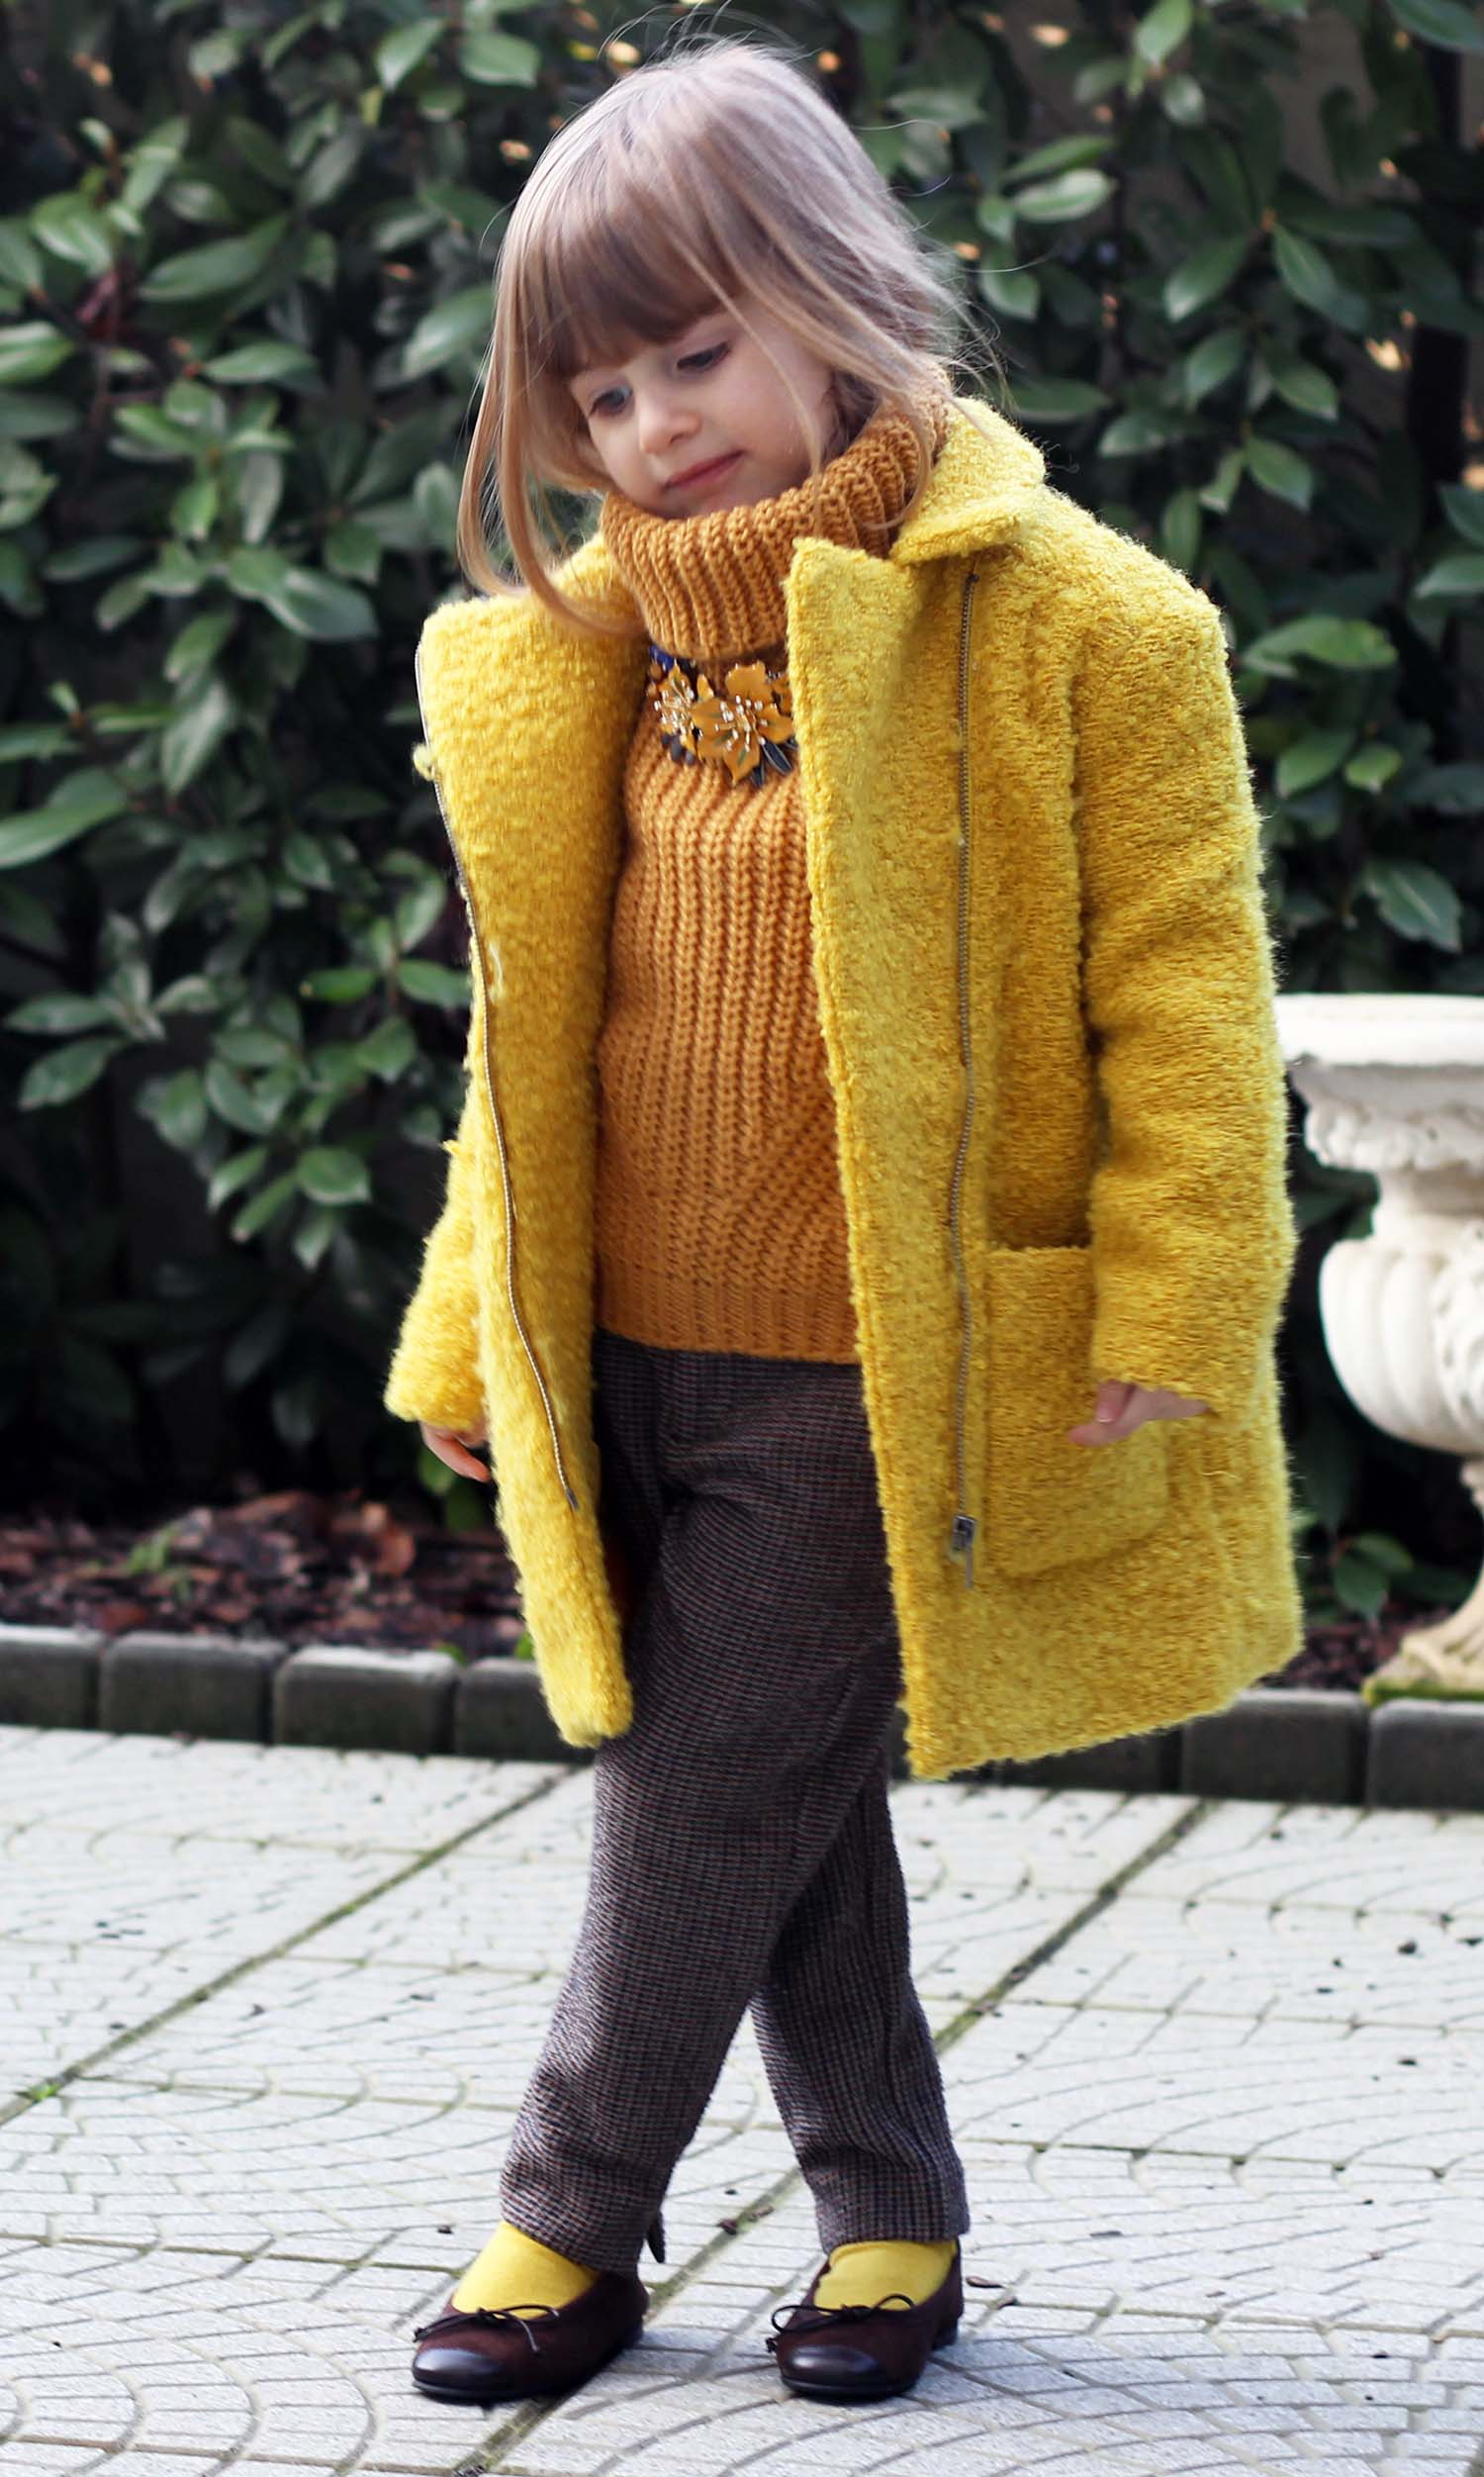 moda bimba cozy look yellow cappotto winter look outfit inverno fashion kids gaia masseroni